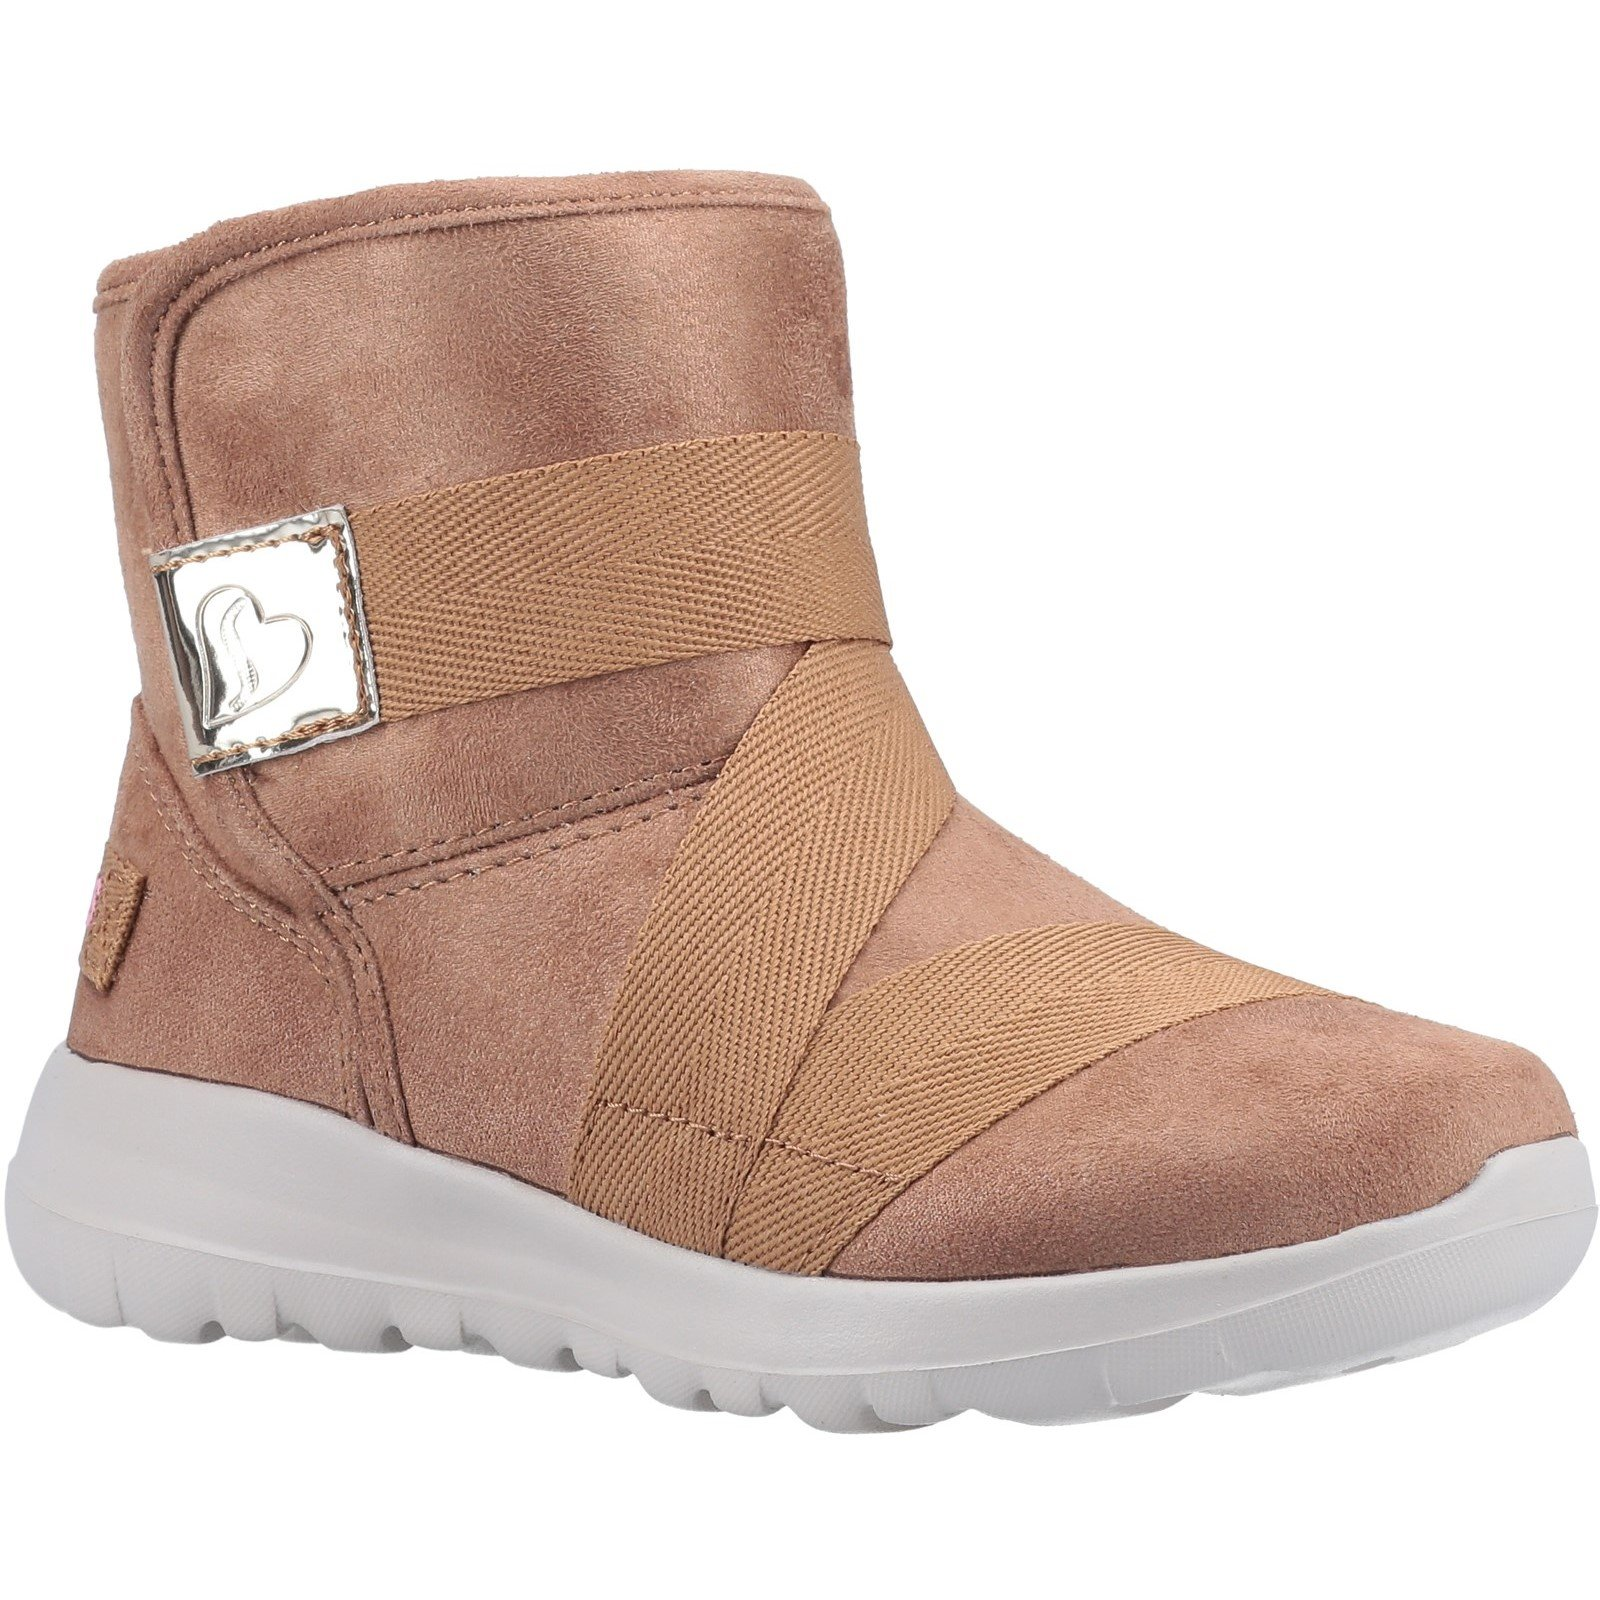 Skechers Unisex Go Walk Joy Strong Willed Ankle Boot Chestnut 31167 - Chestnut 12.5